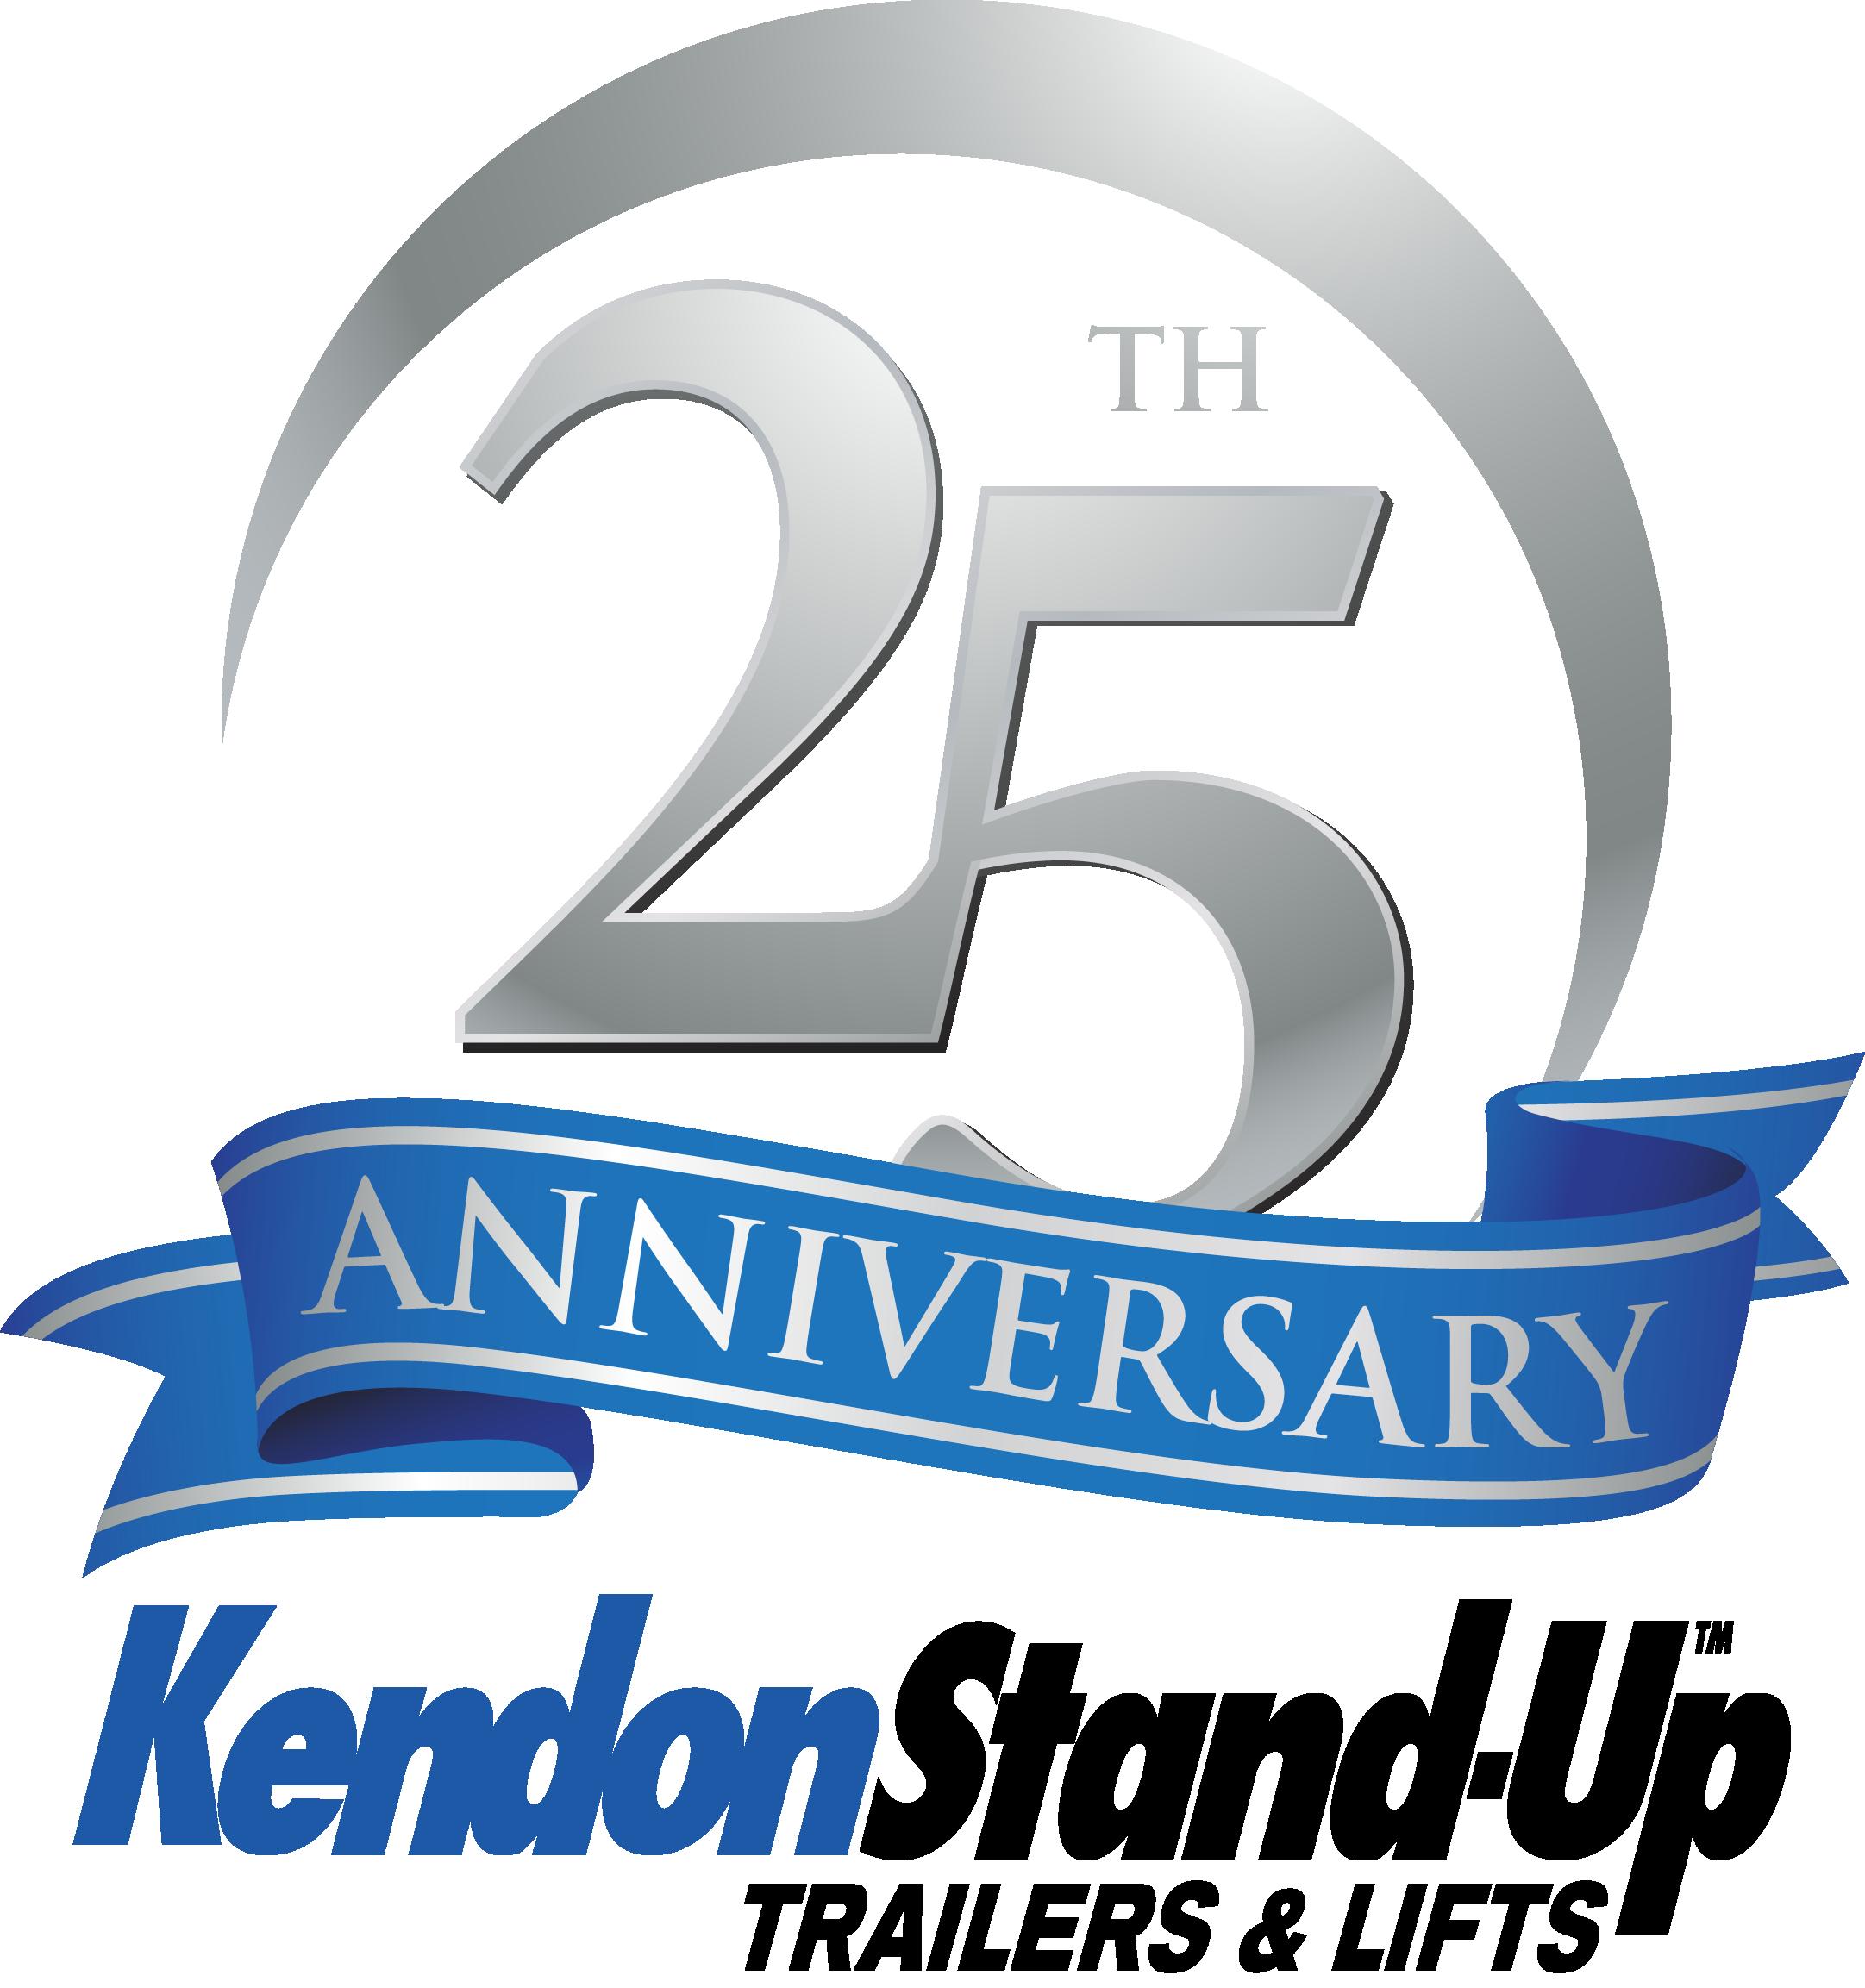 Competition clipart winner logo. Kendon industries announces winners